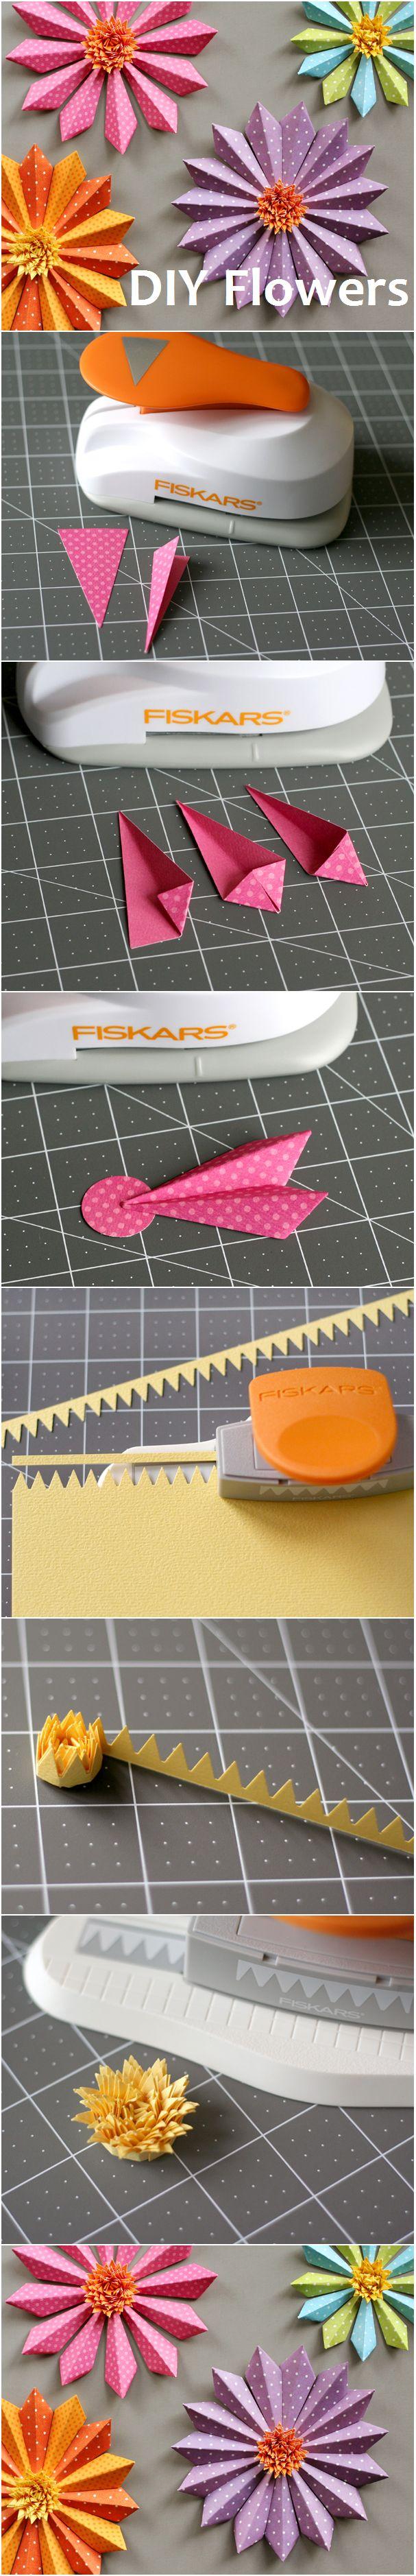 #DIY Paper Flowers Tutorial www2.fiskars.com